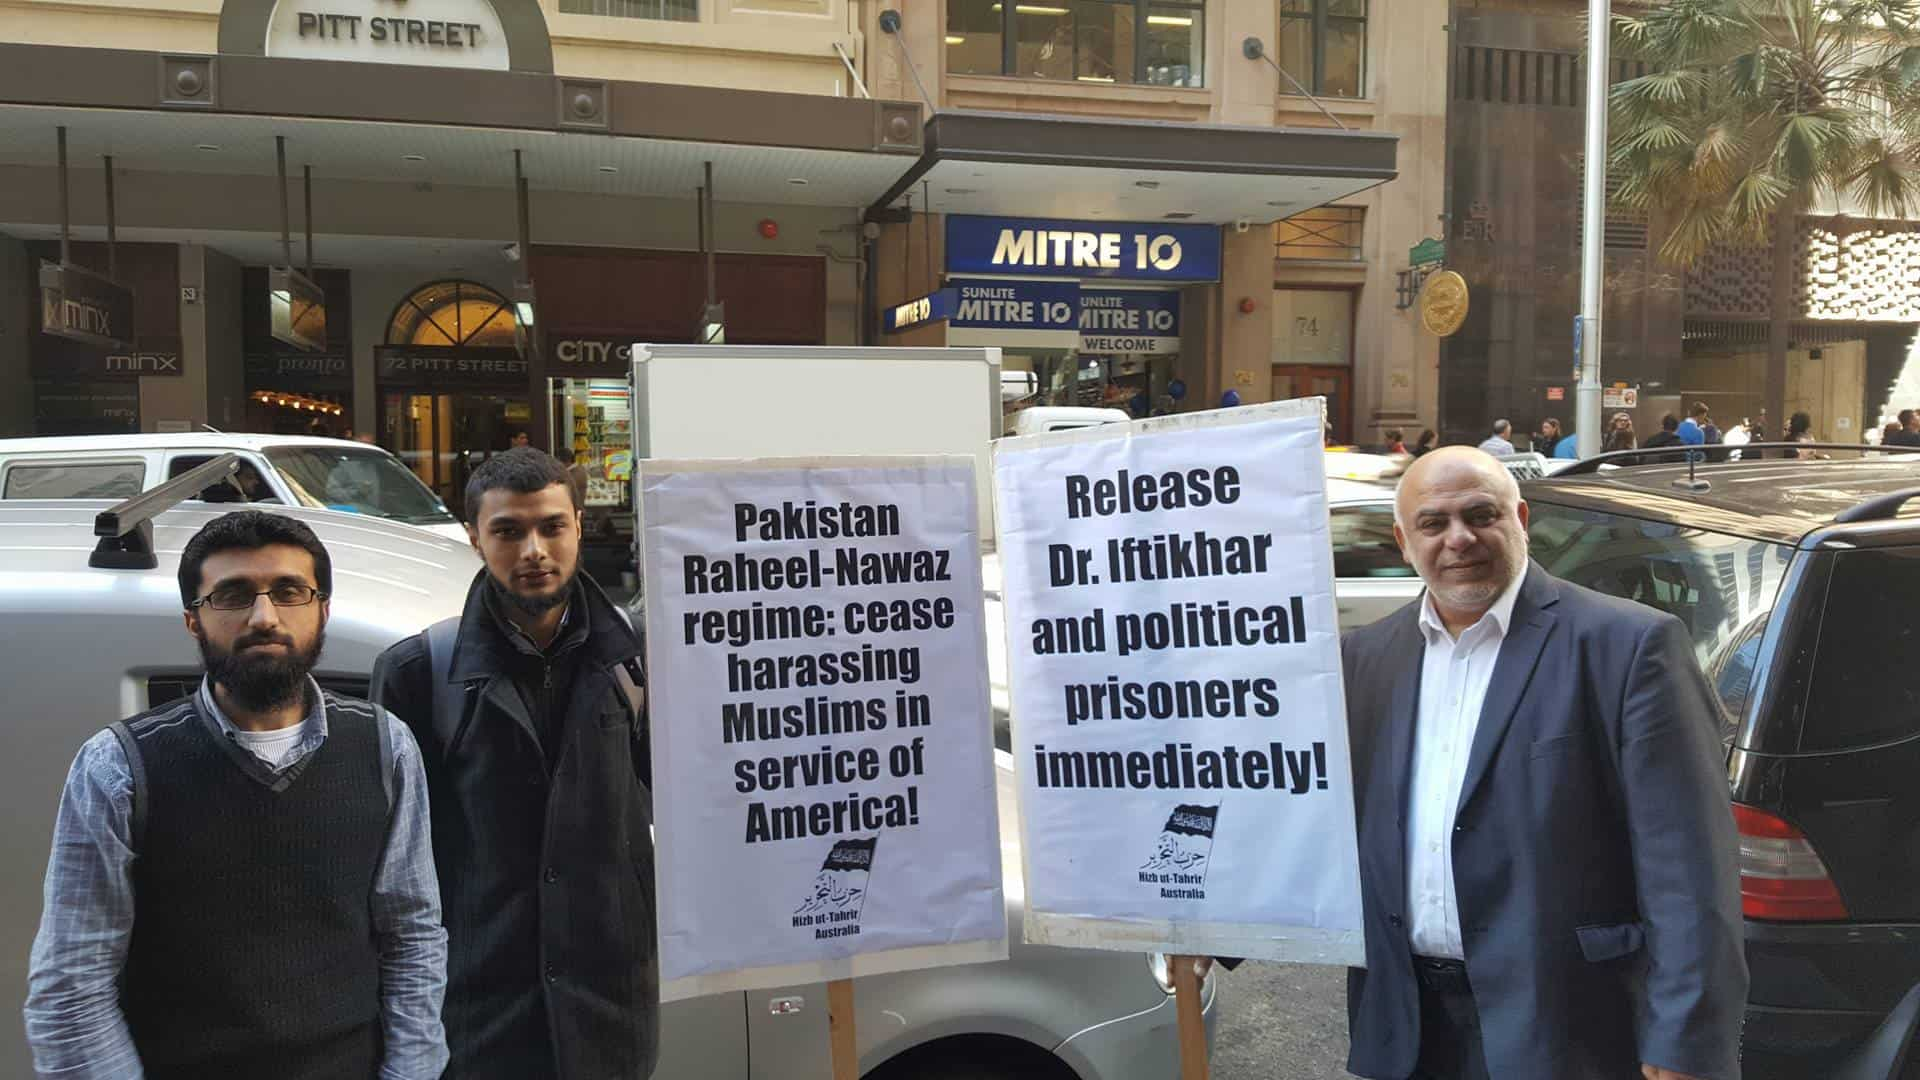 Delegation to Pakistani Consulate regarding Dr. Iftikhar